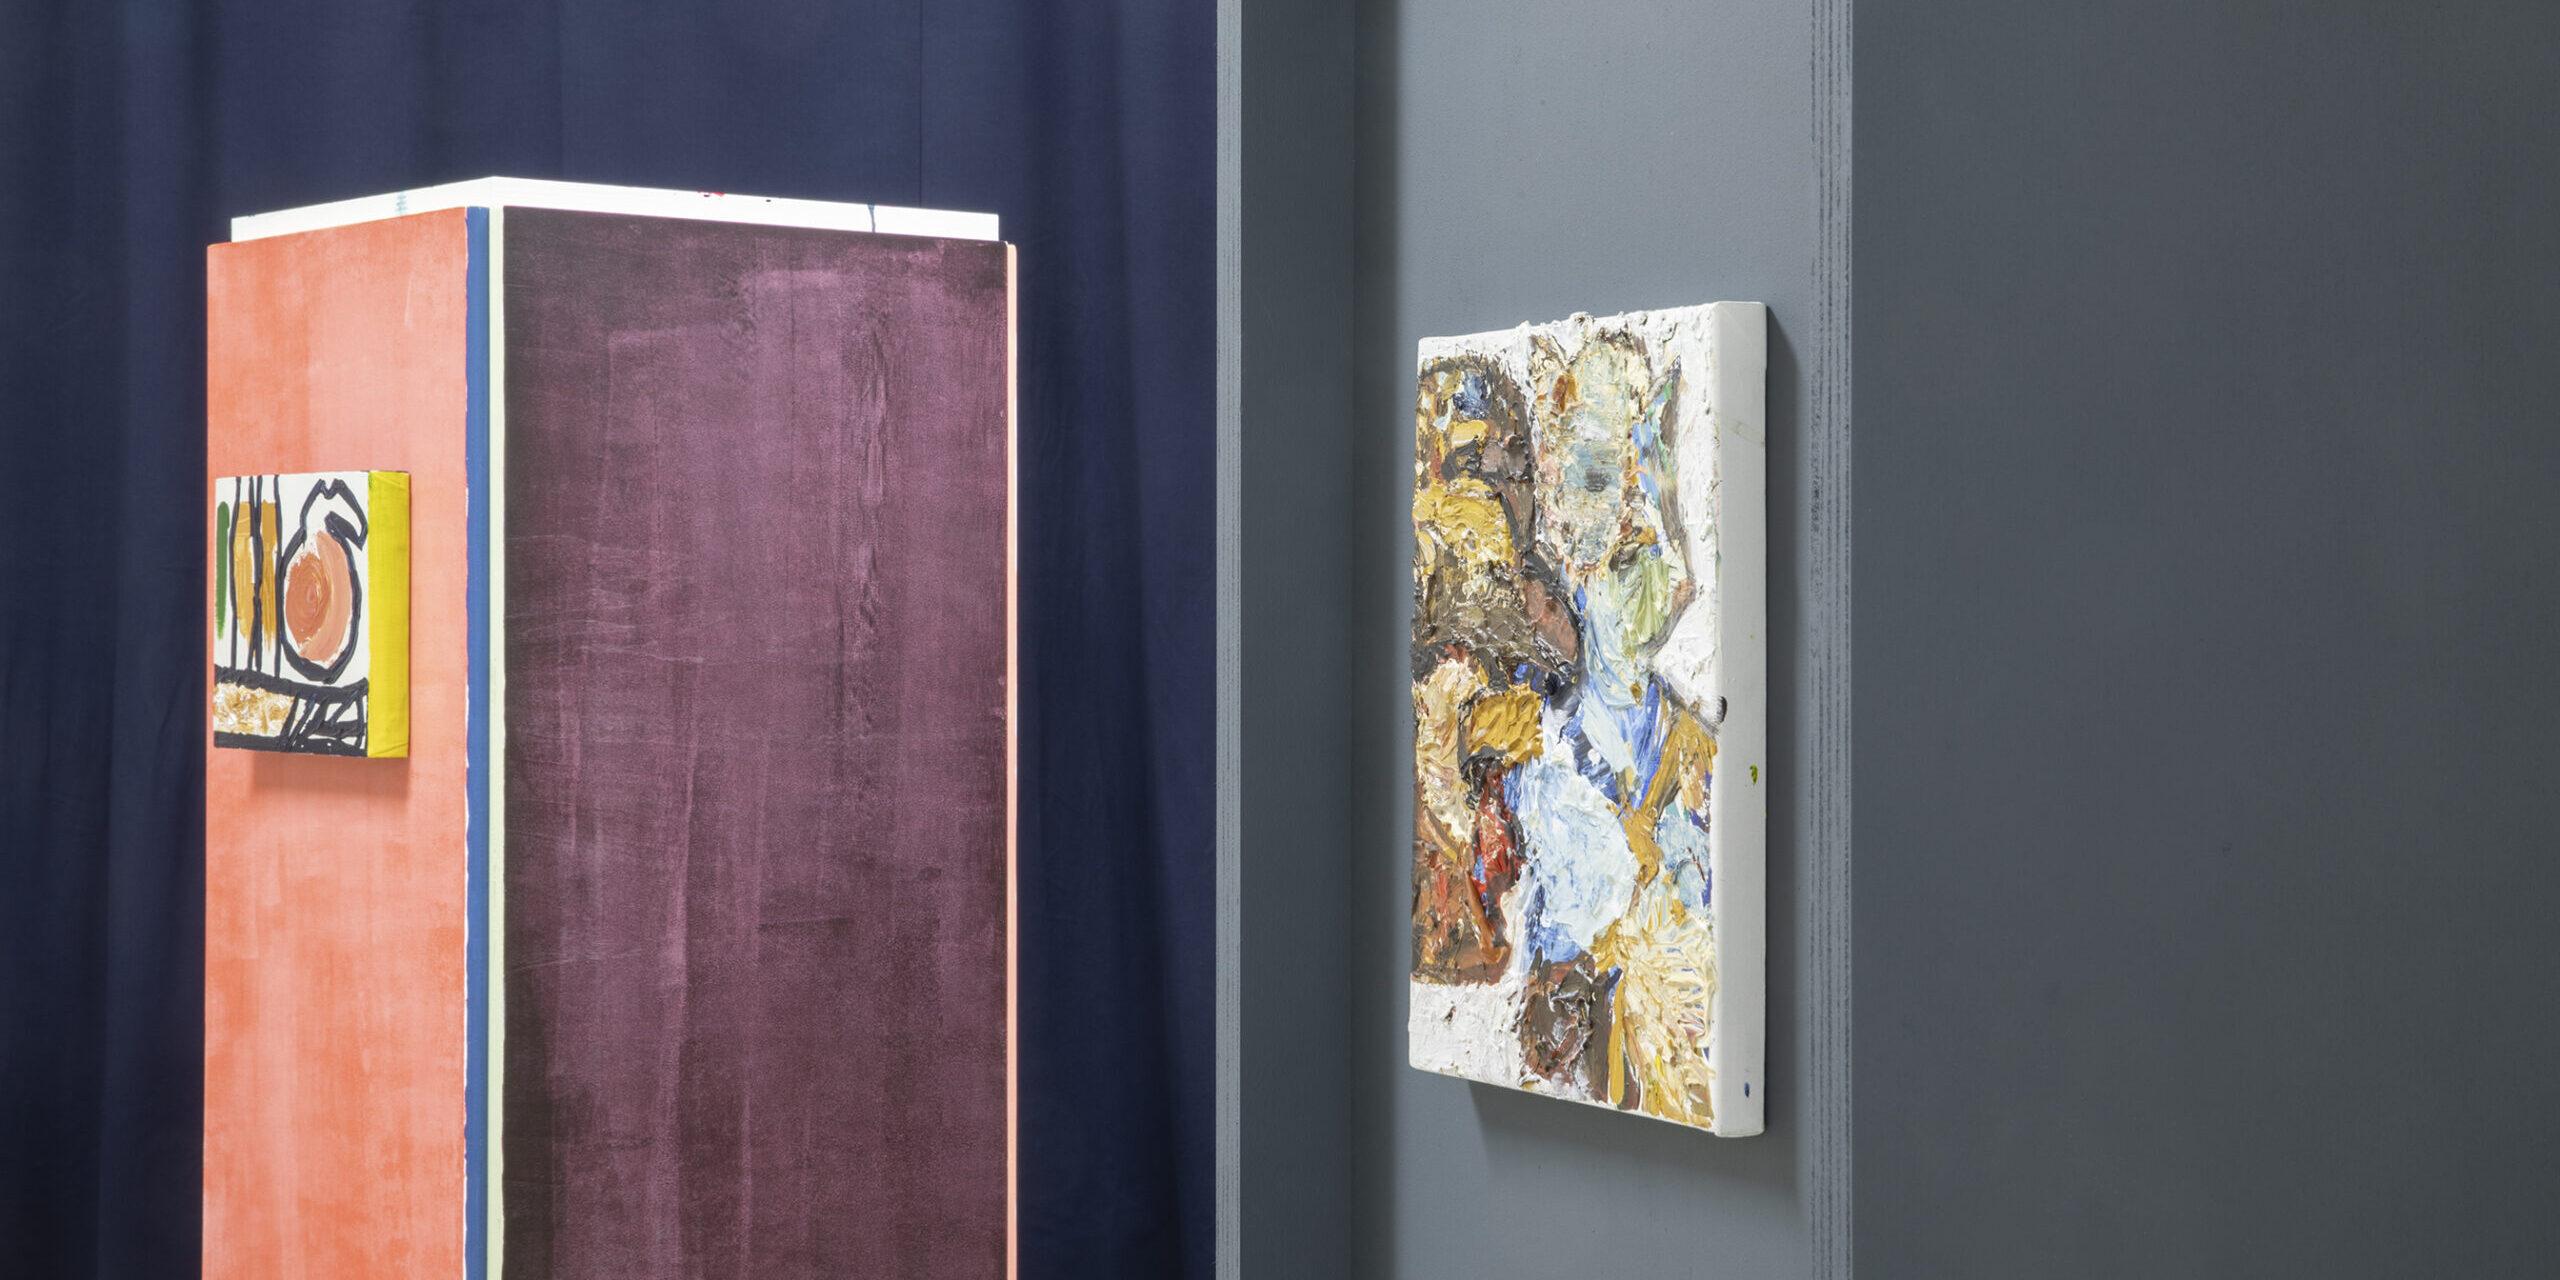 Andrea Kvas, Untitled (details) with Pharaildis Van den Broeck's painting, installation view Project Room #3, courtesy Archivio Atelier Pharaildis Van den Broeck, ph Jacopo Menzani